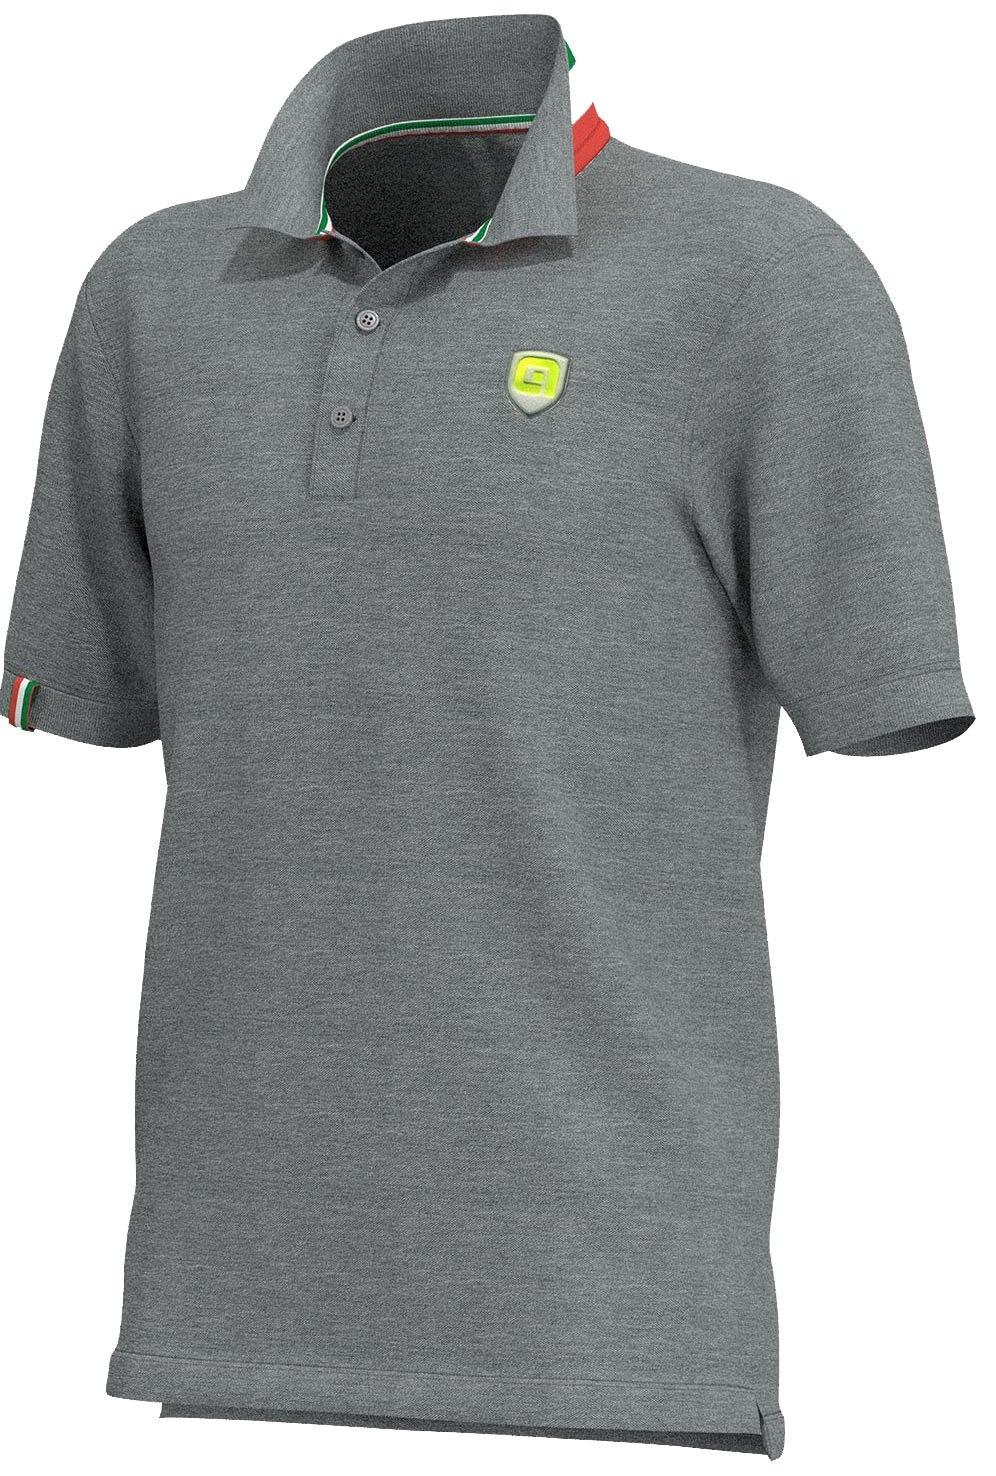 Alé Polo T-Shirt Men - Grå